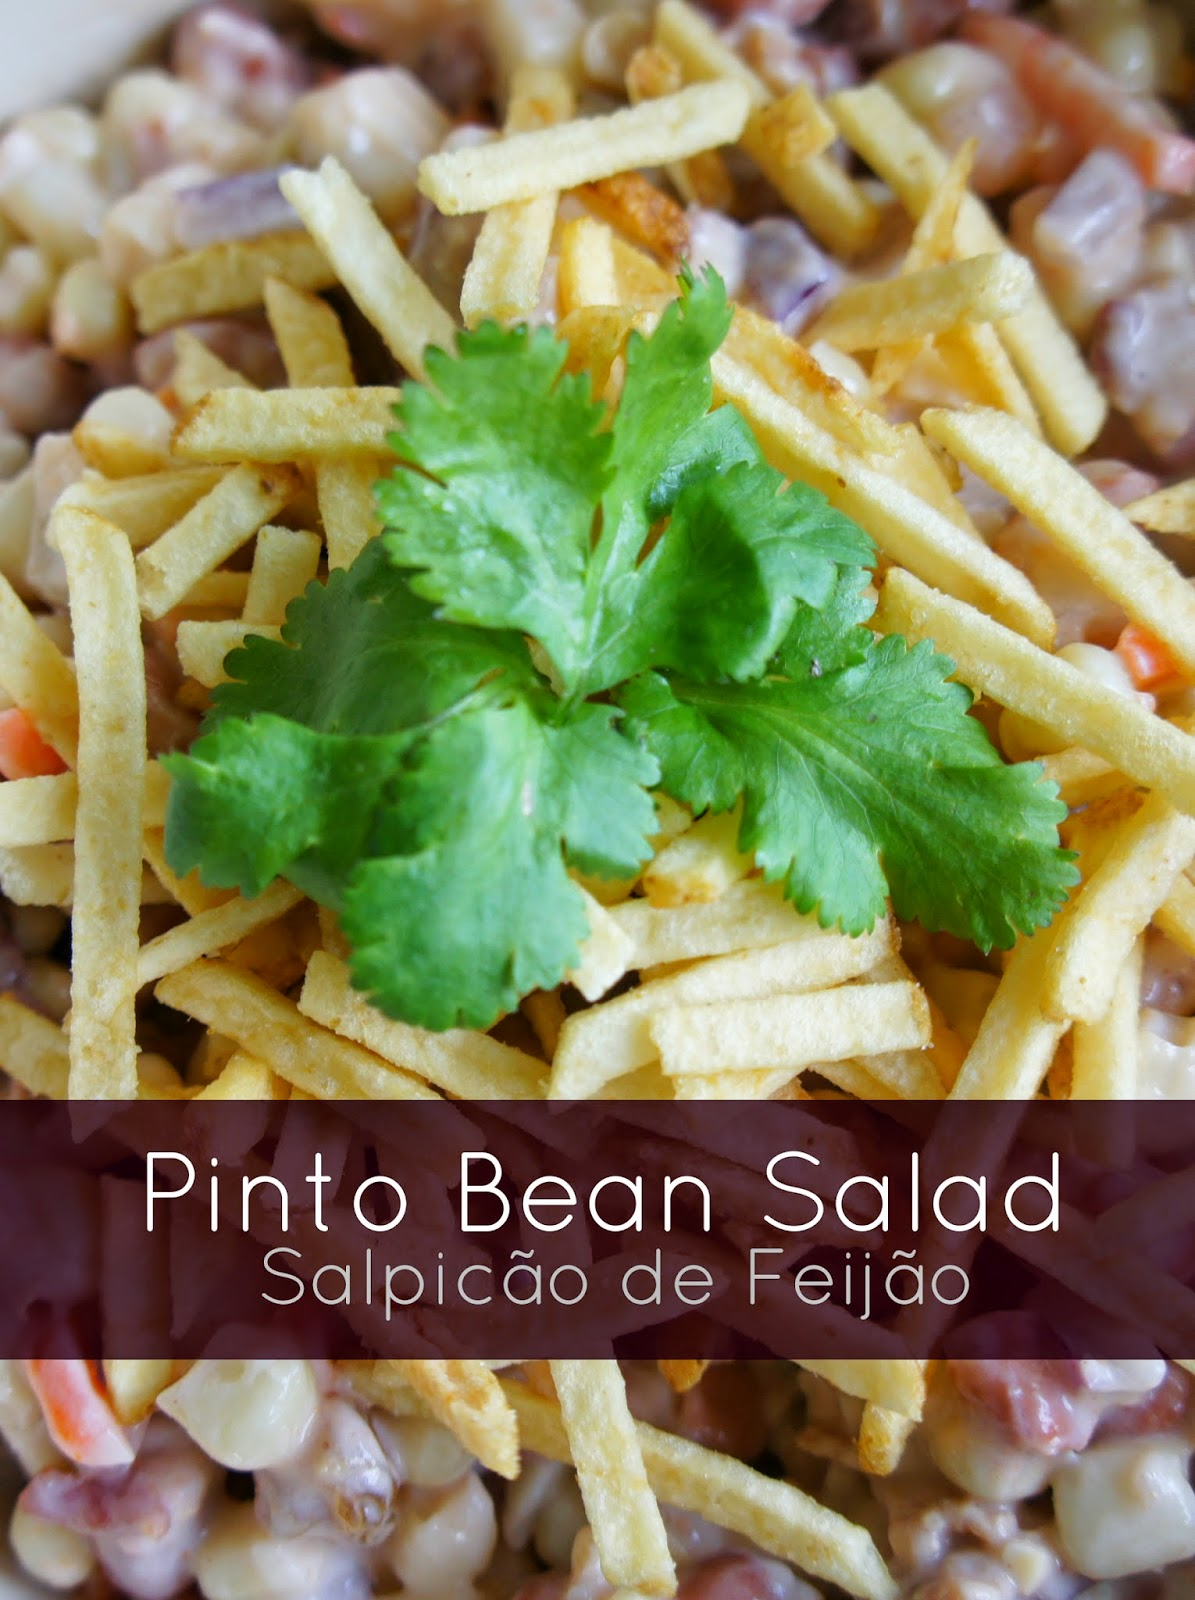 Pinto Bean Salad Recipe using Bushs Cocina Latina